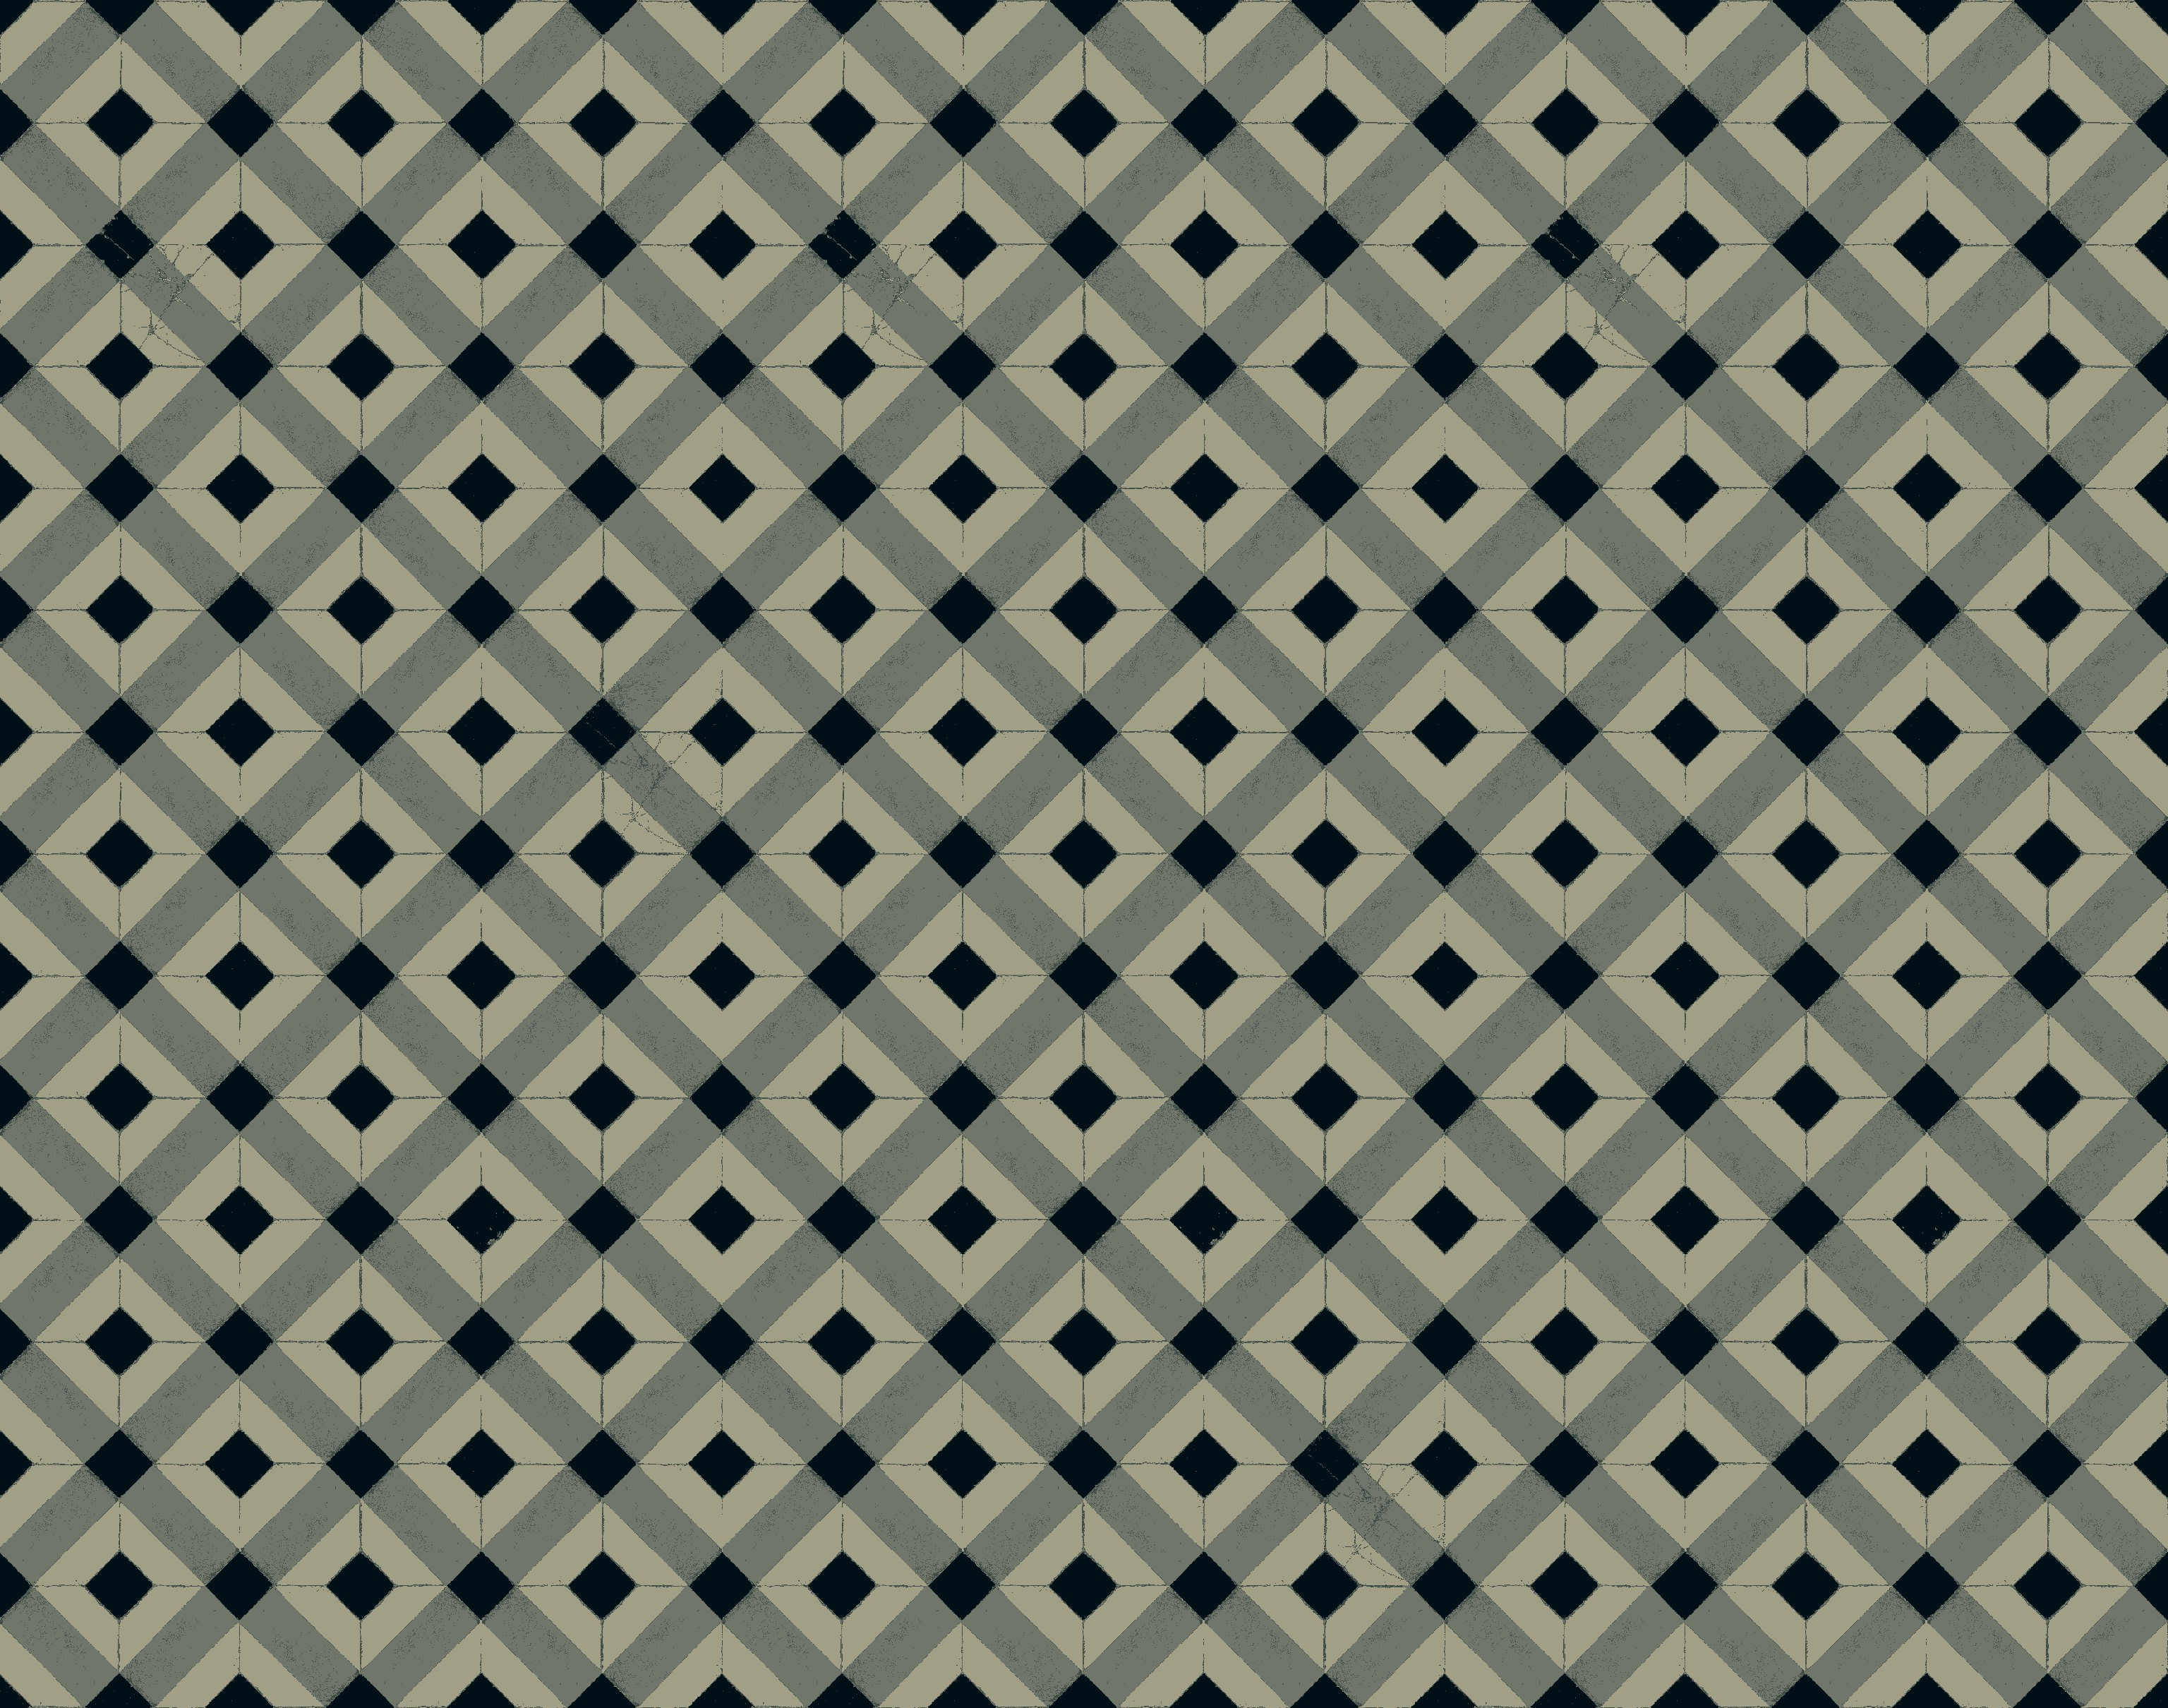 carreaux  grey